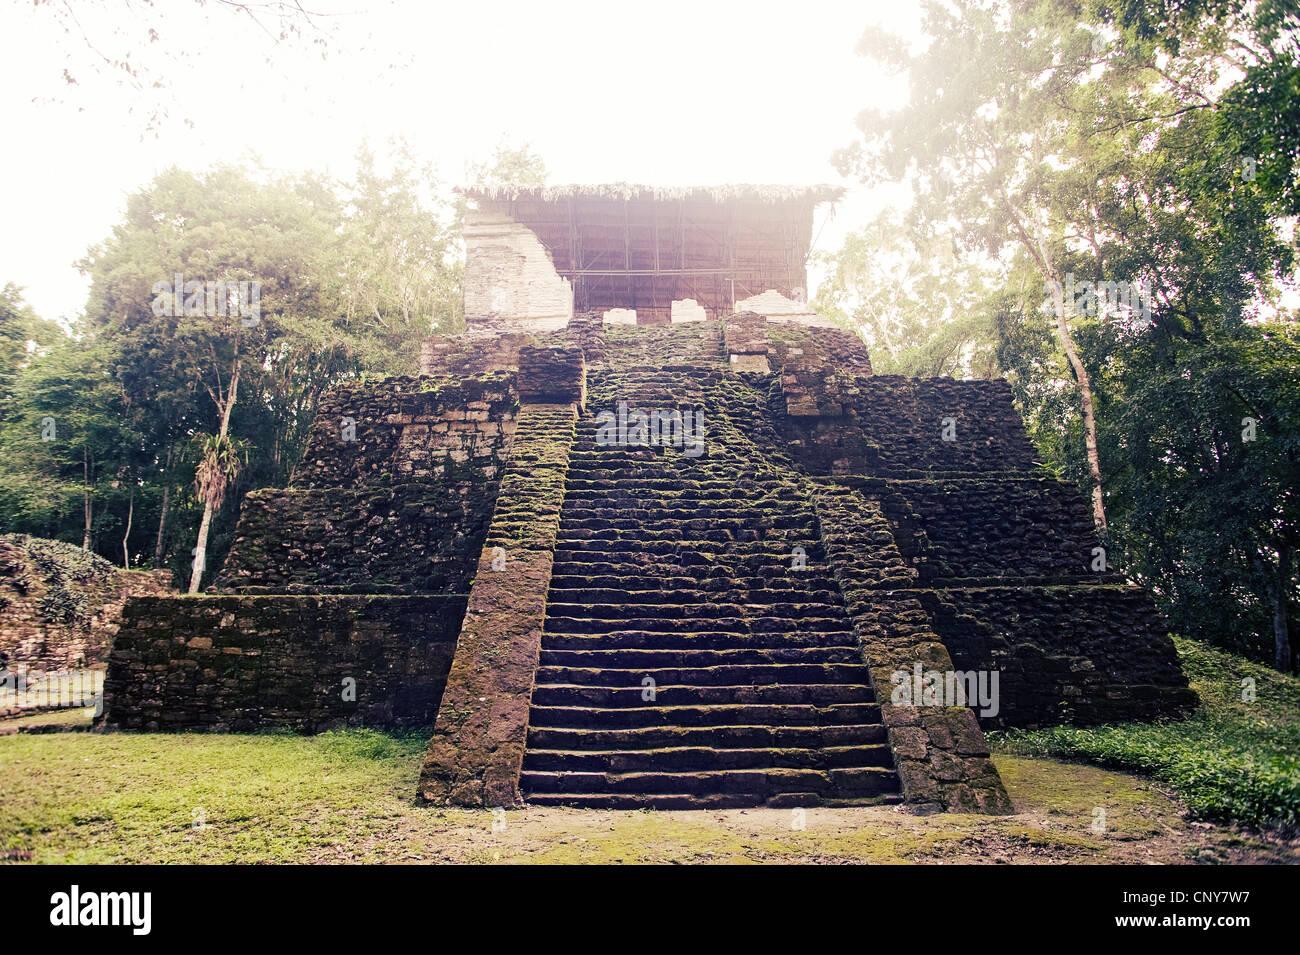 Ruins of Topoxte, Guatemala - Stock Image